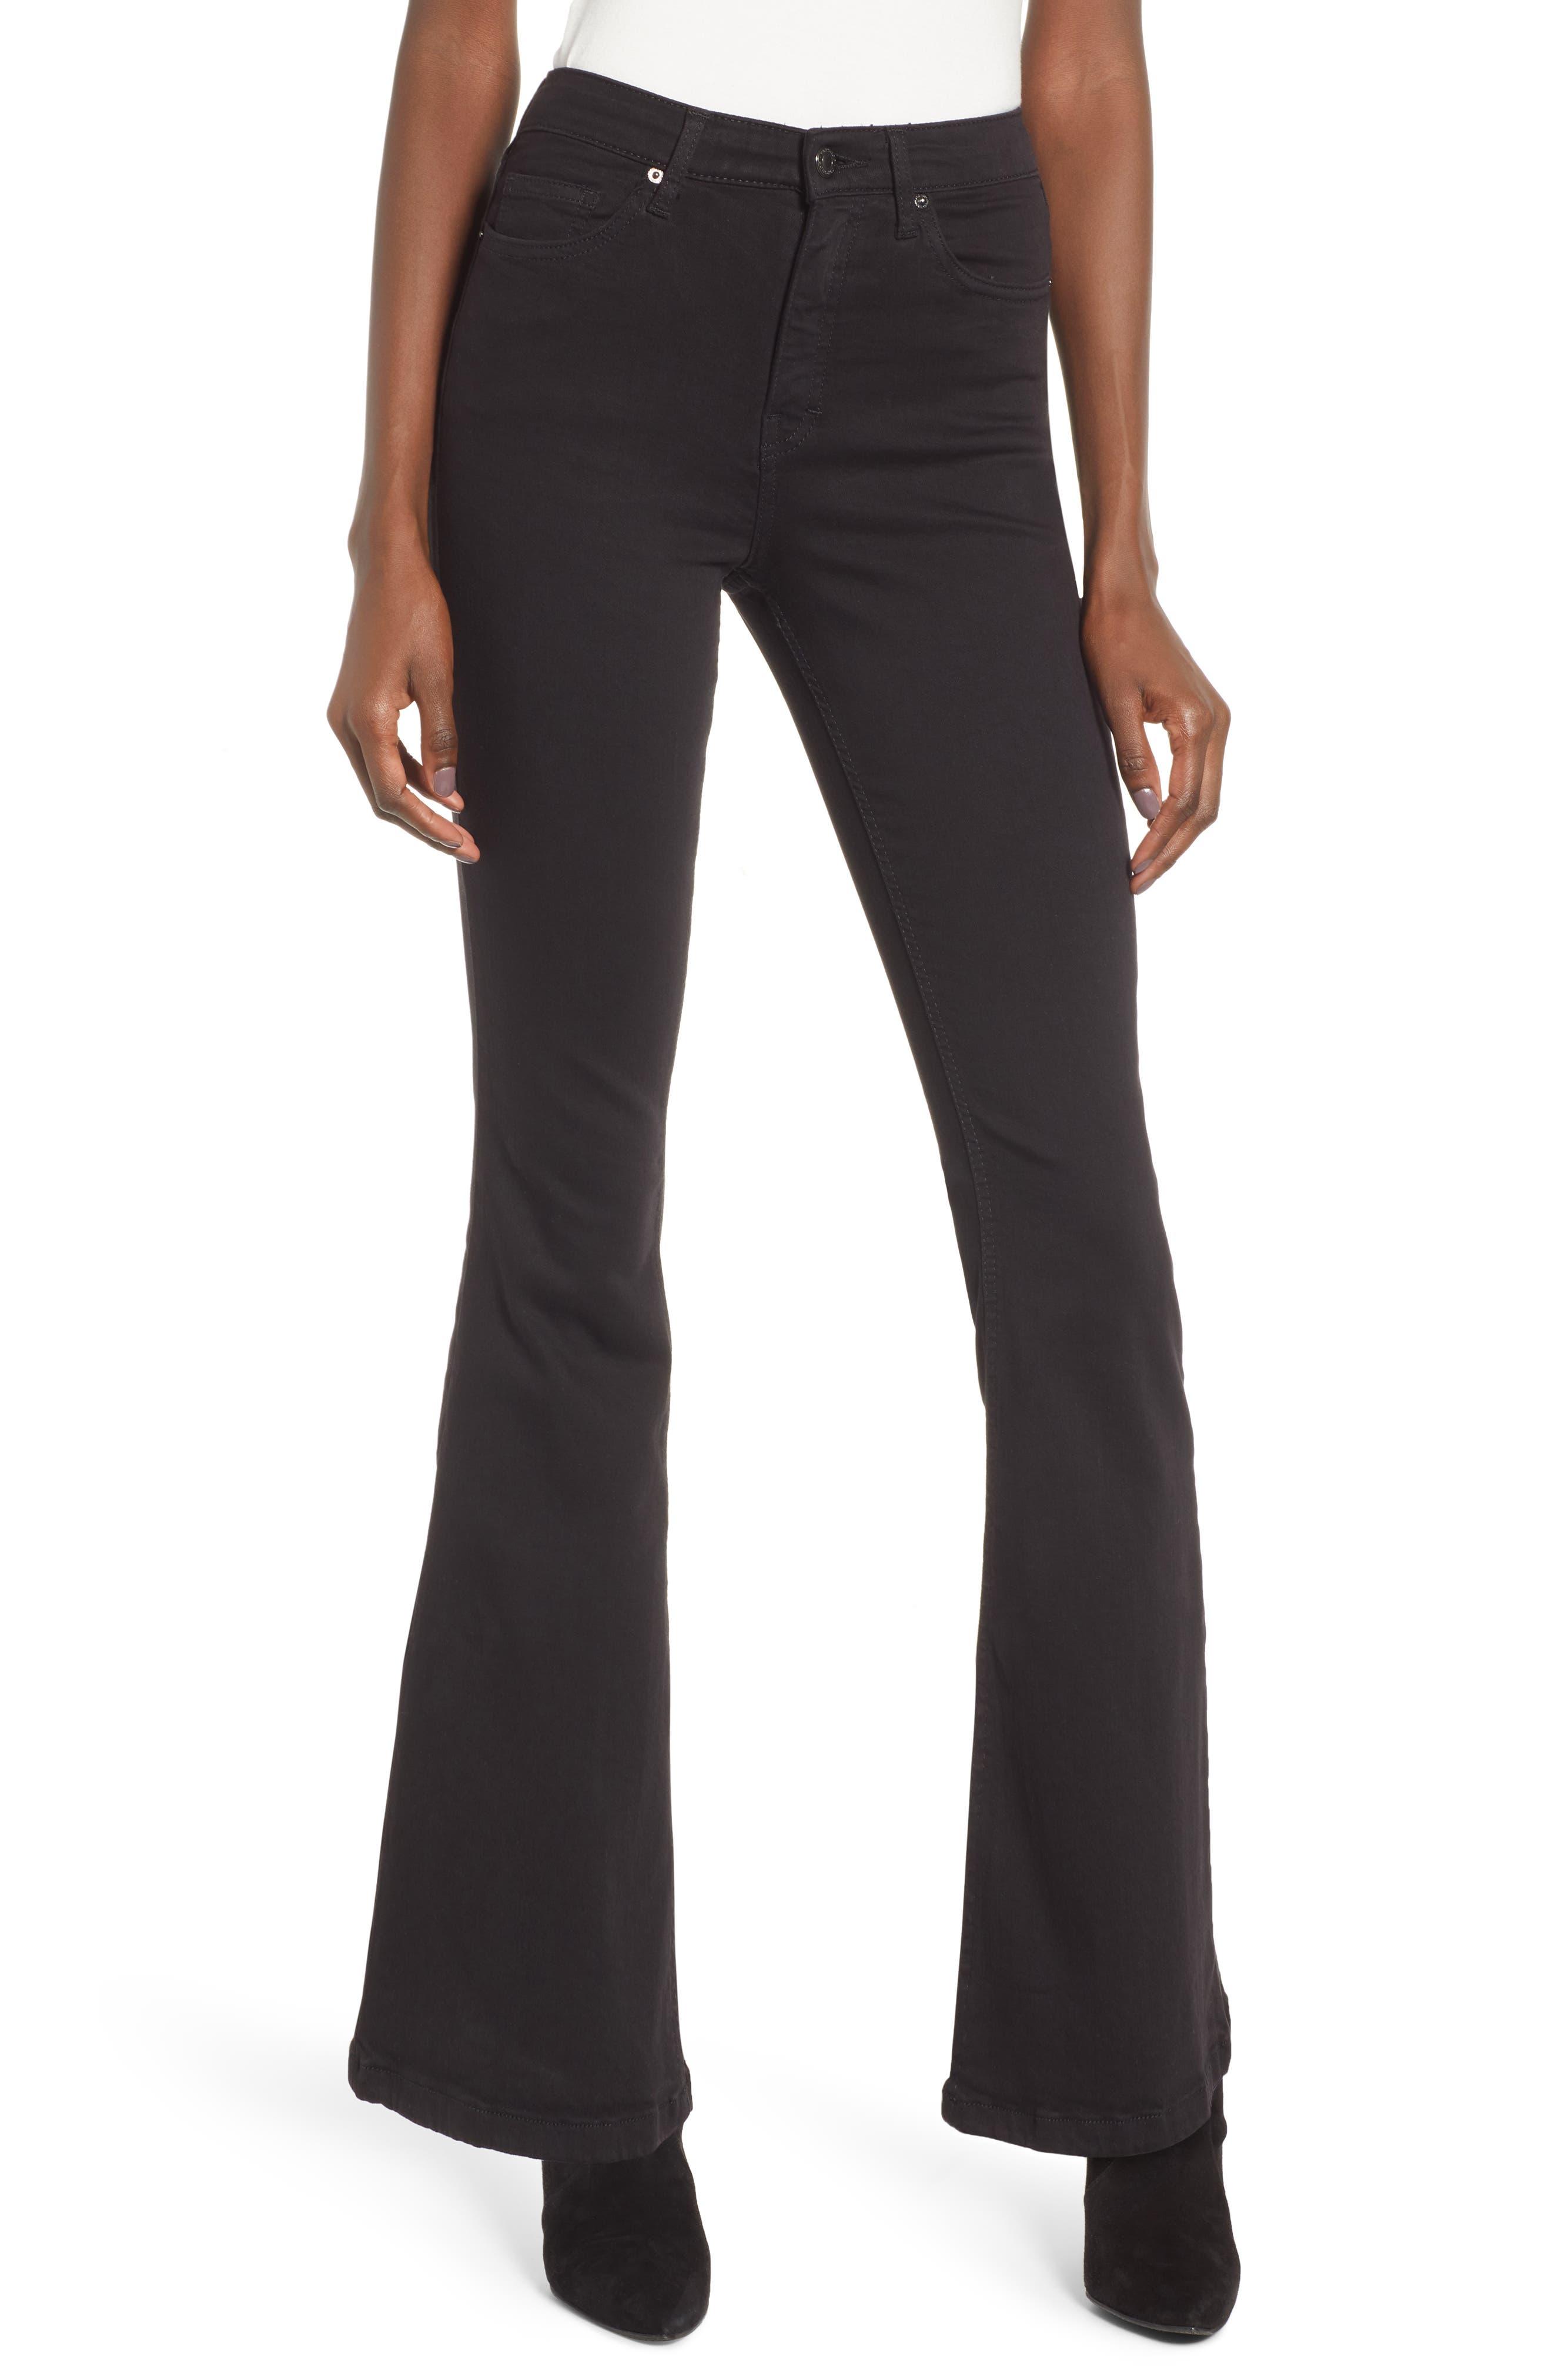 Petite Women's Topshop Jamie High Waist Flare Leg Jeans